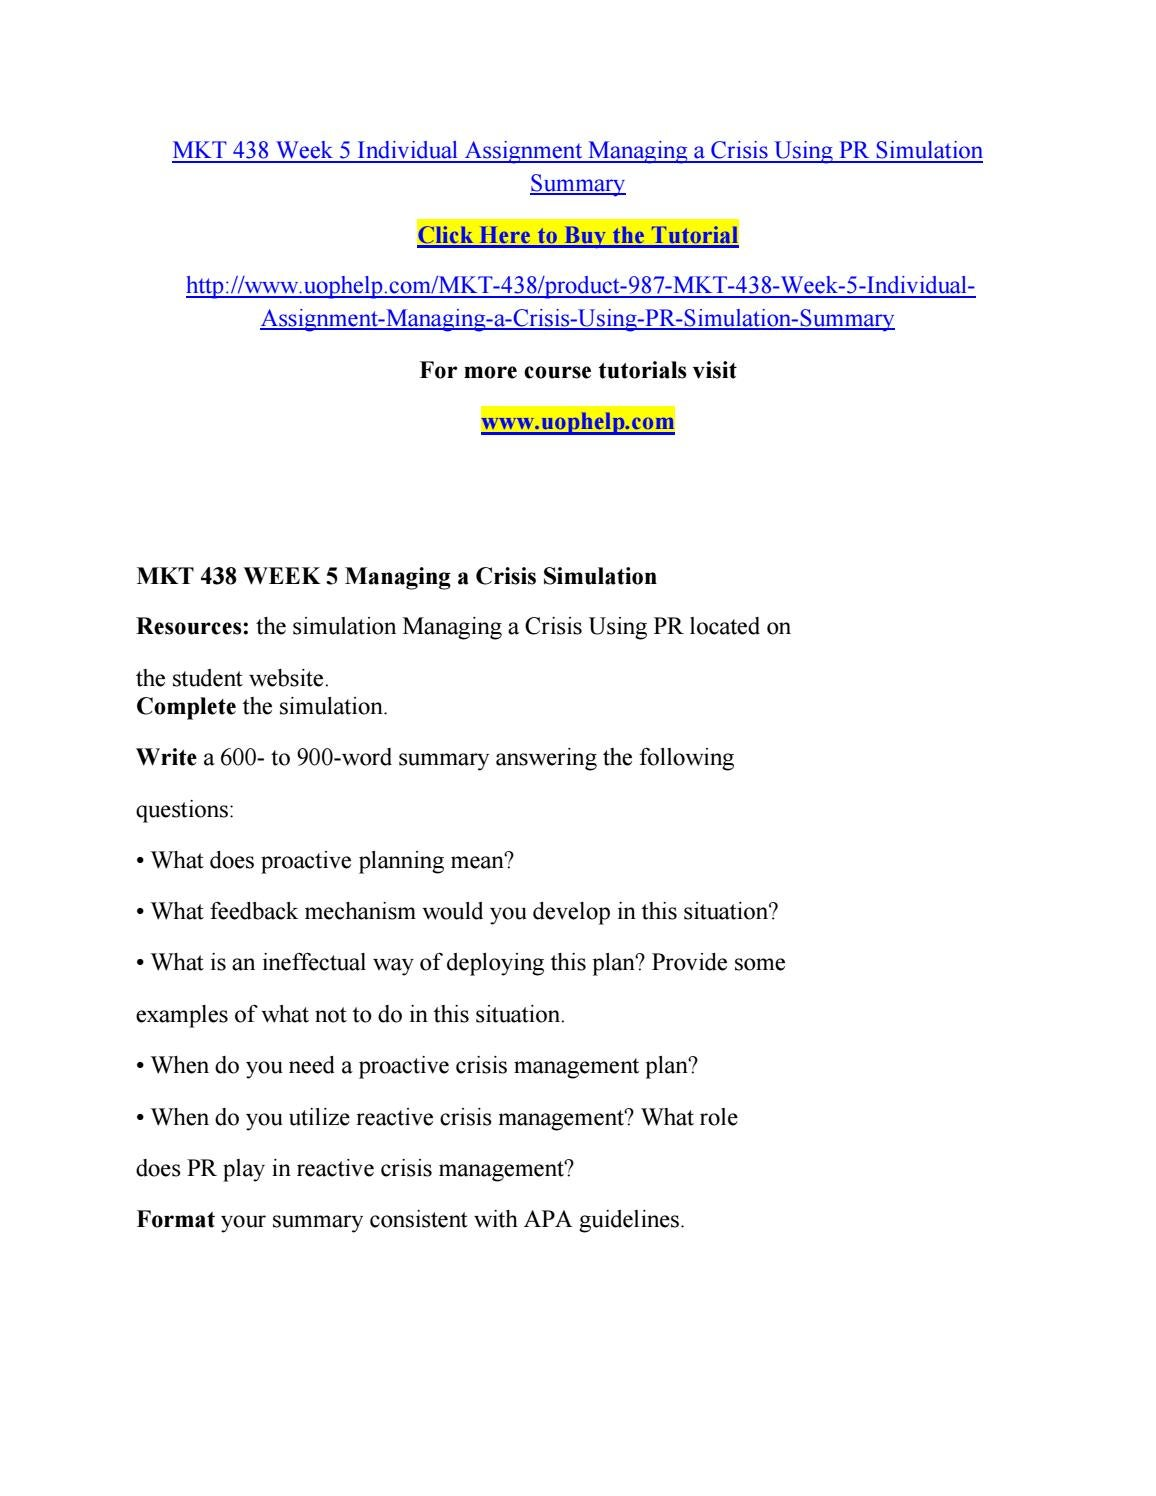 managing a crisis using pr simulation mkt 438